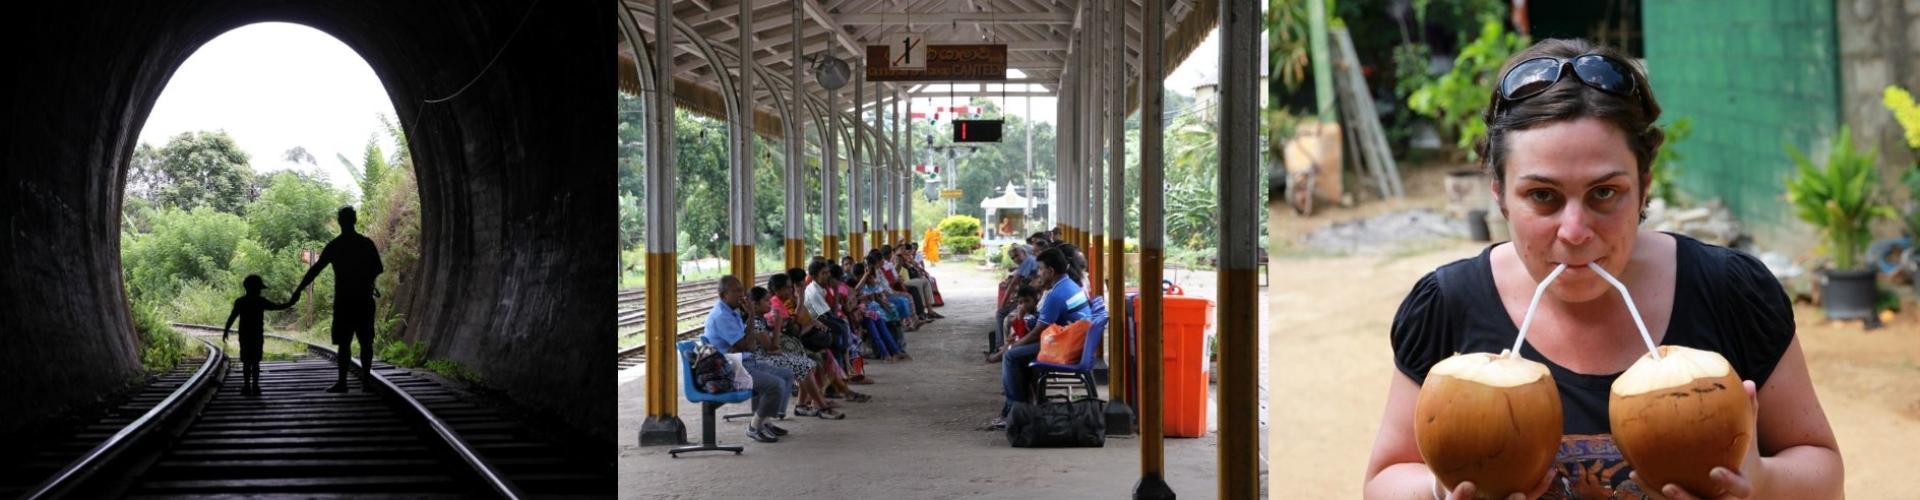 Sri Lanka rondreis met kinderen